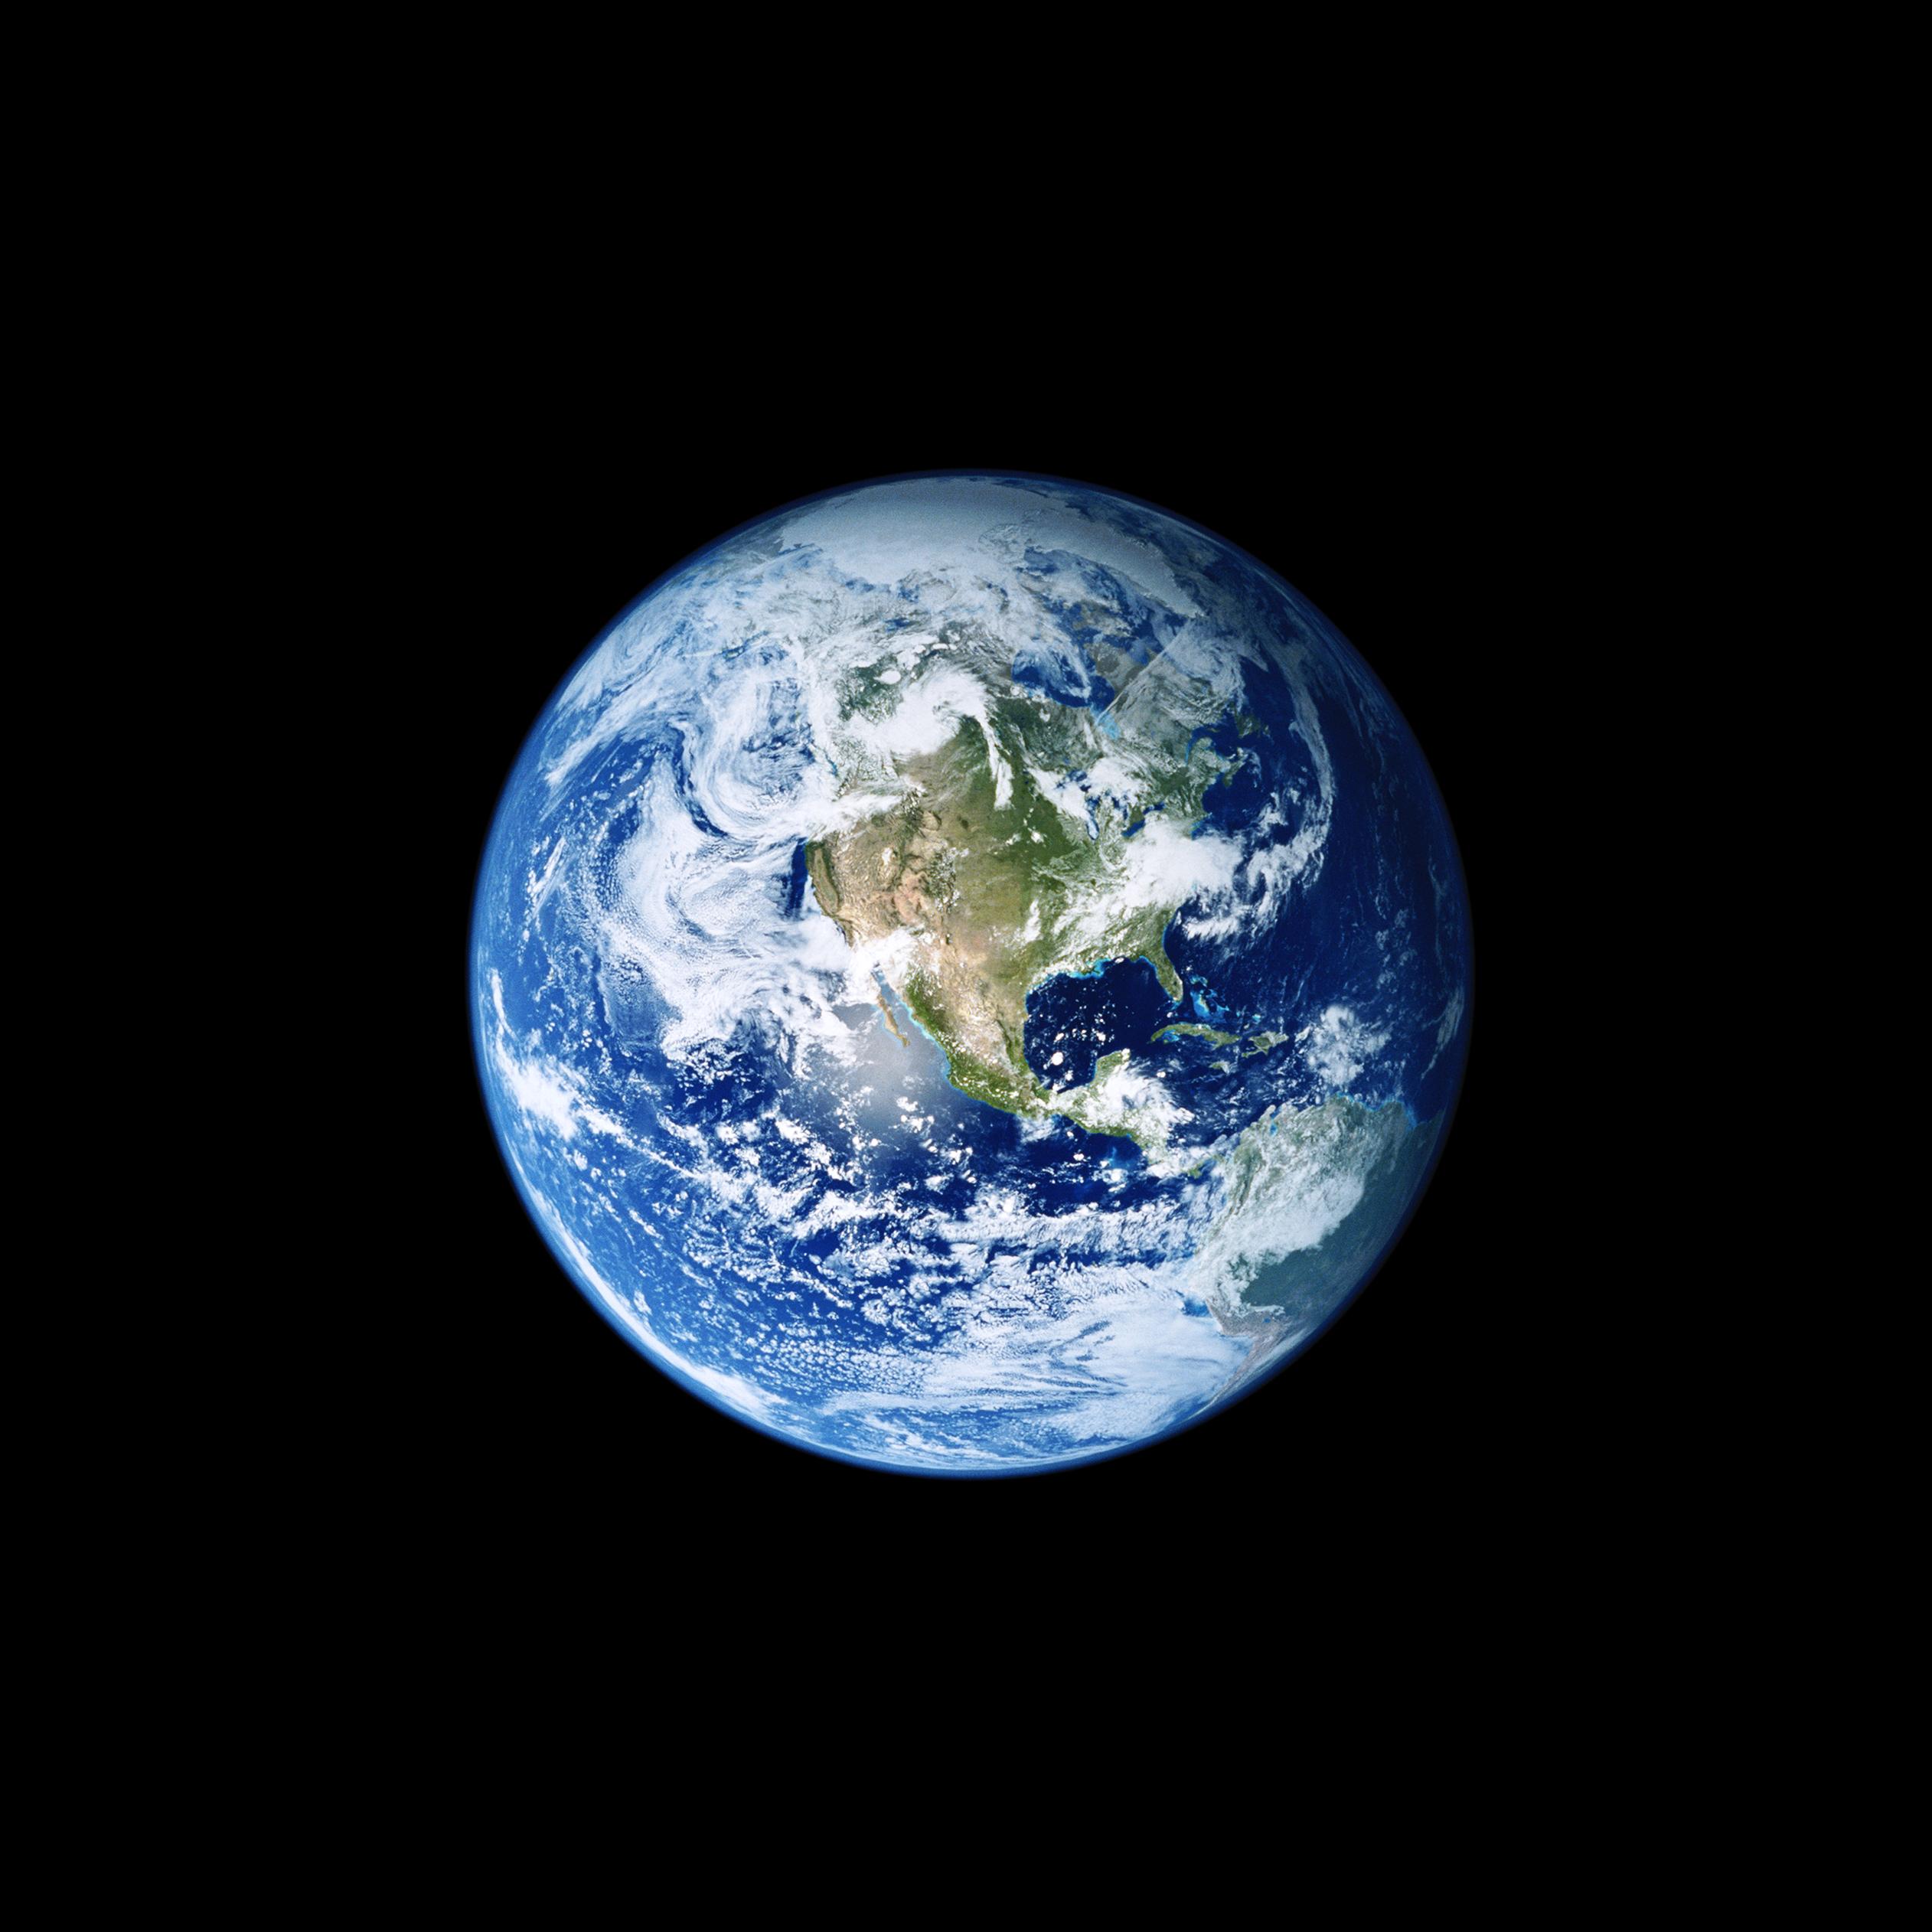 Earth iOS 11 GM iPad wallpapers - Trọn bộ hình nền mới của iOS 11